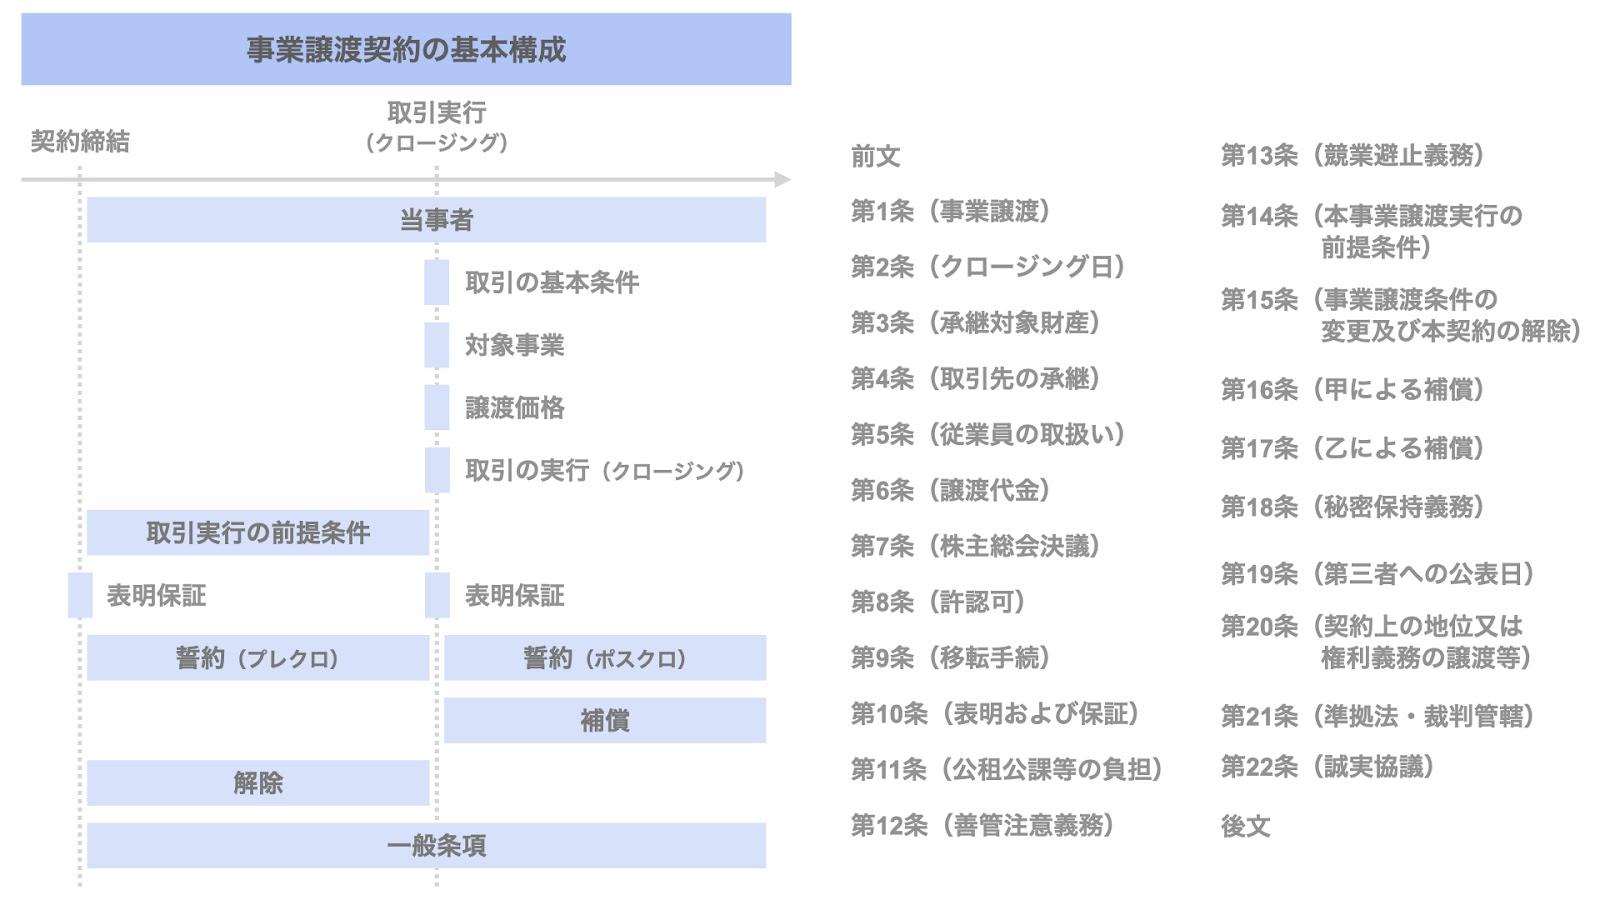 事業譲渡契約書の基本構成